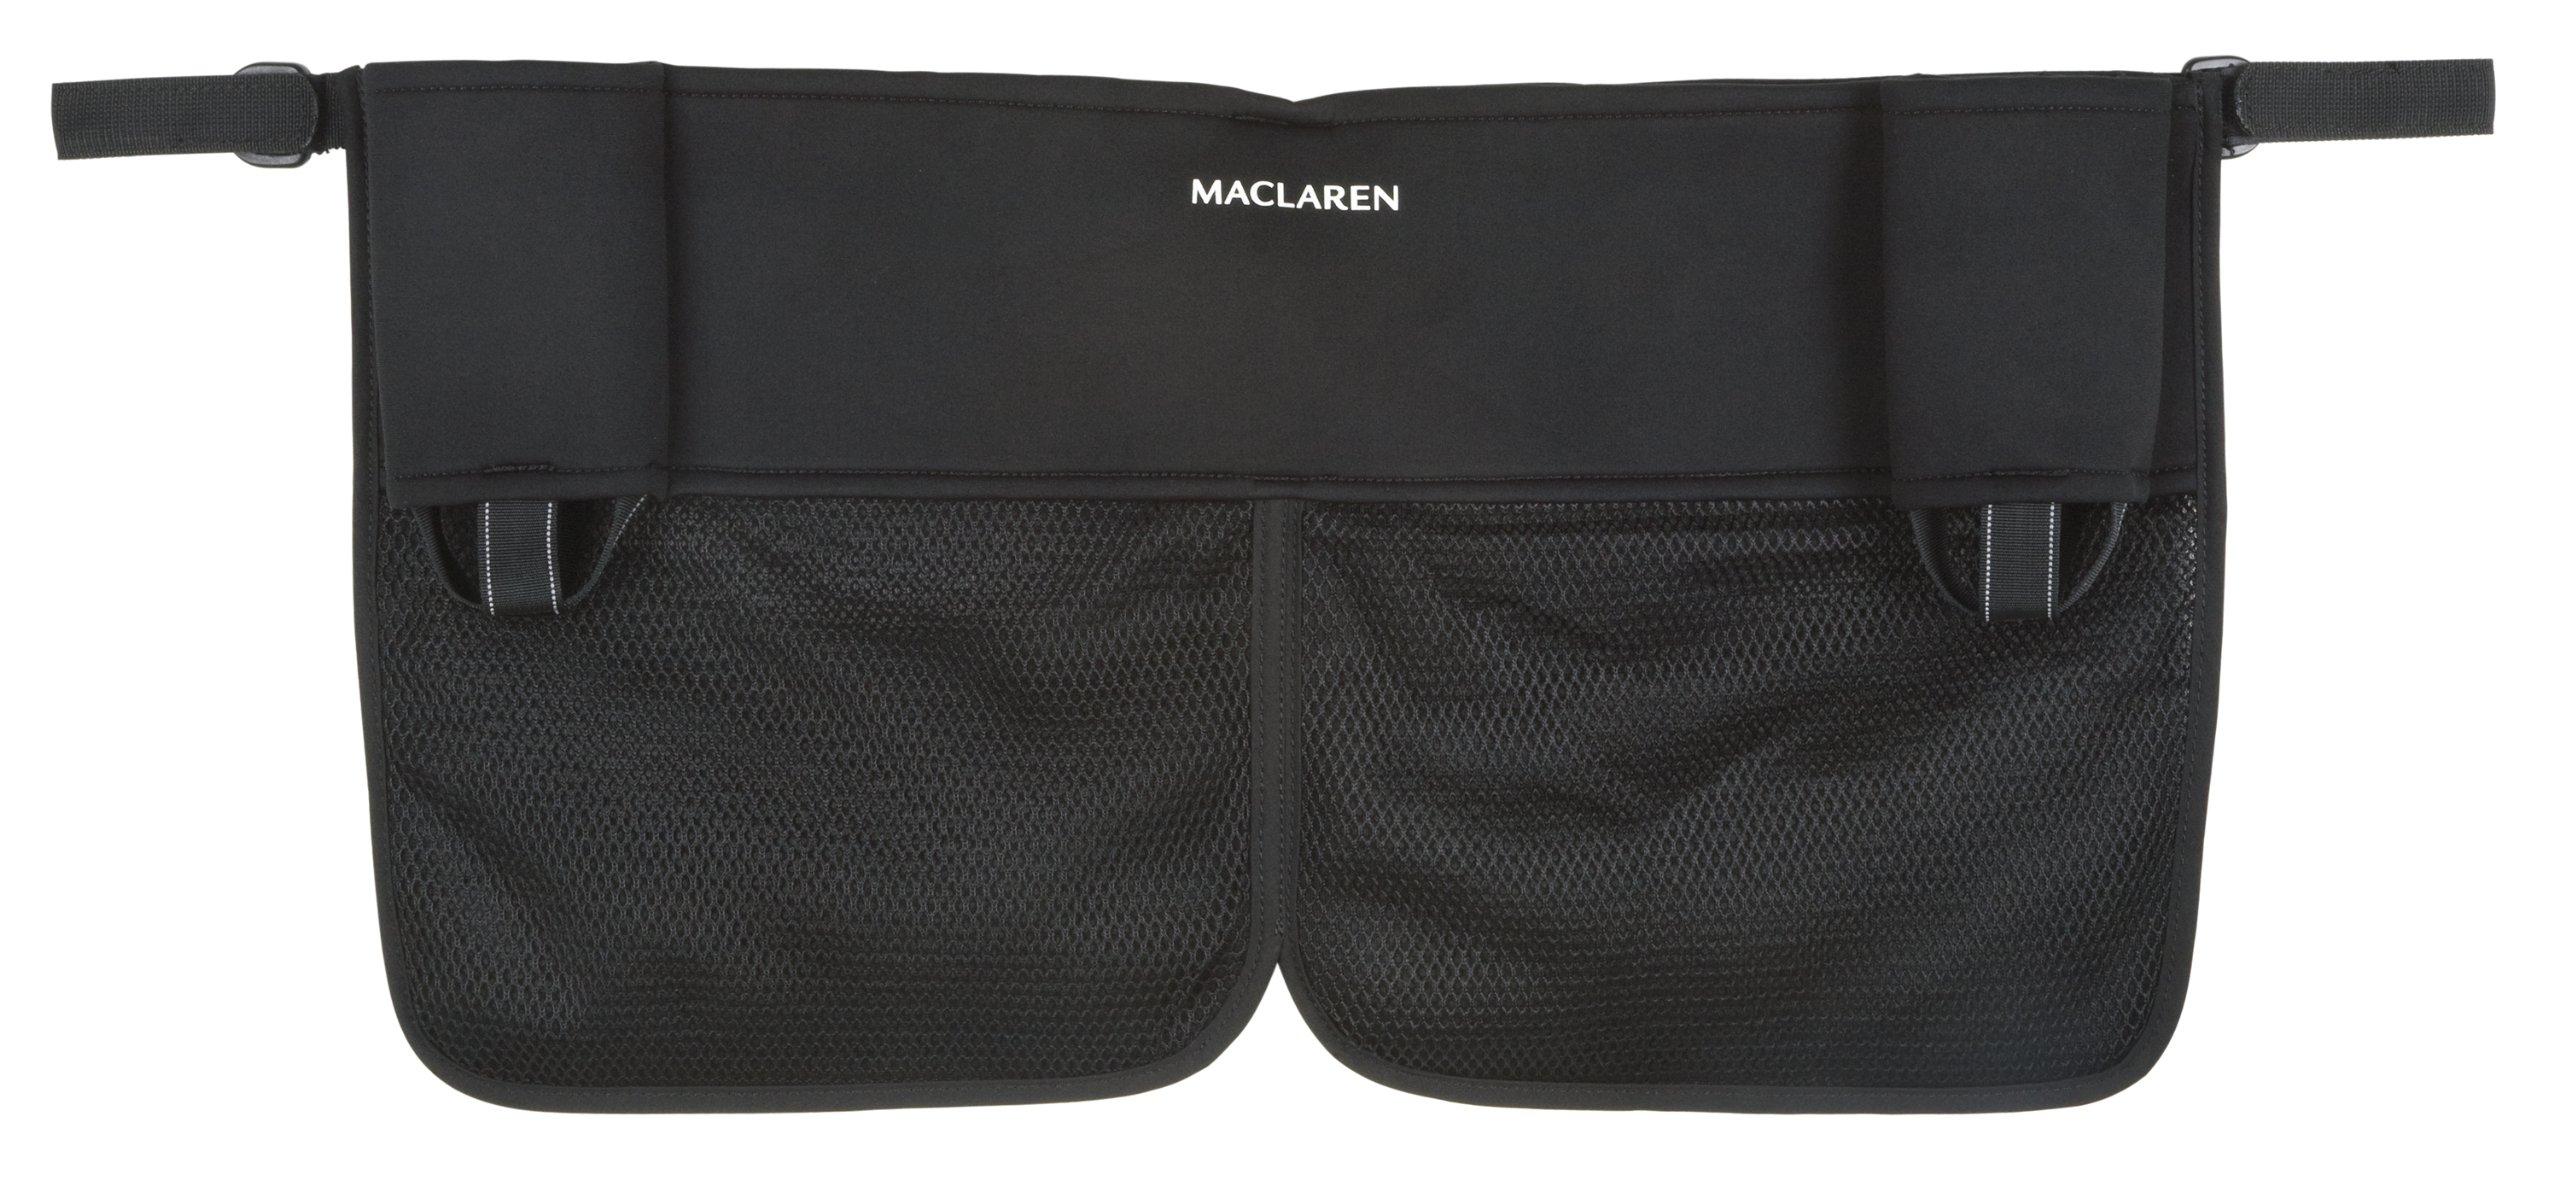 Maclaren Universal Organizer, Twin- Black